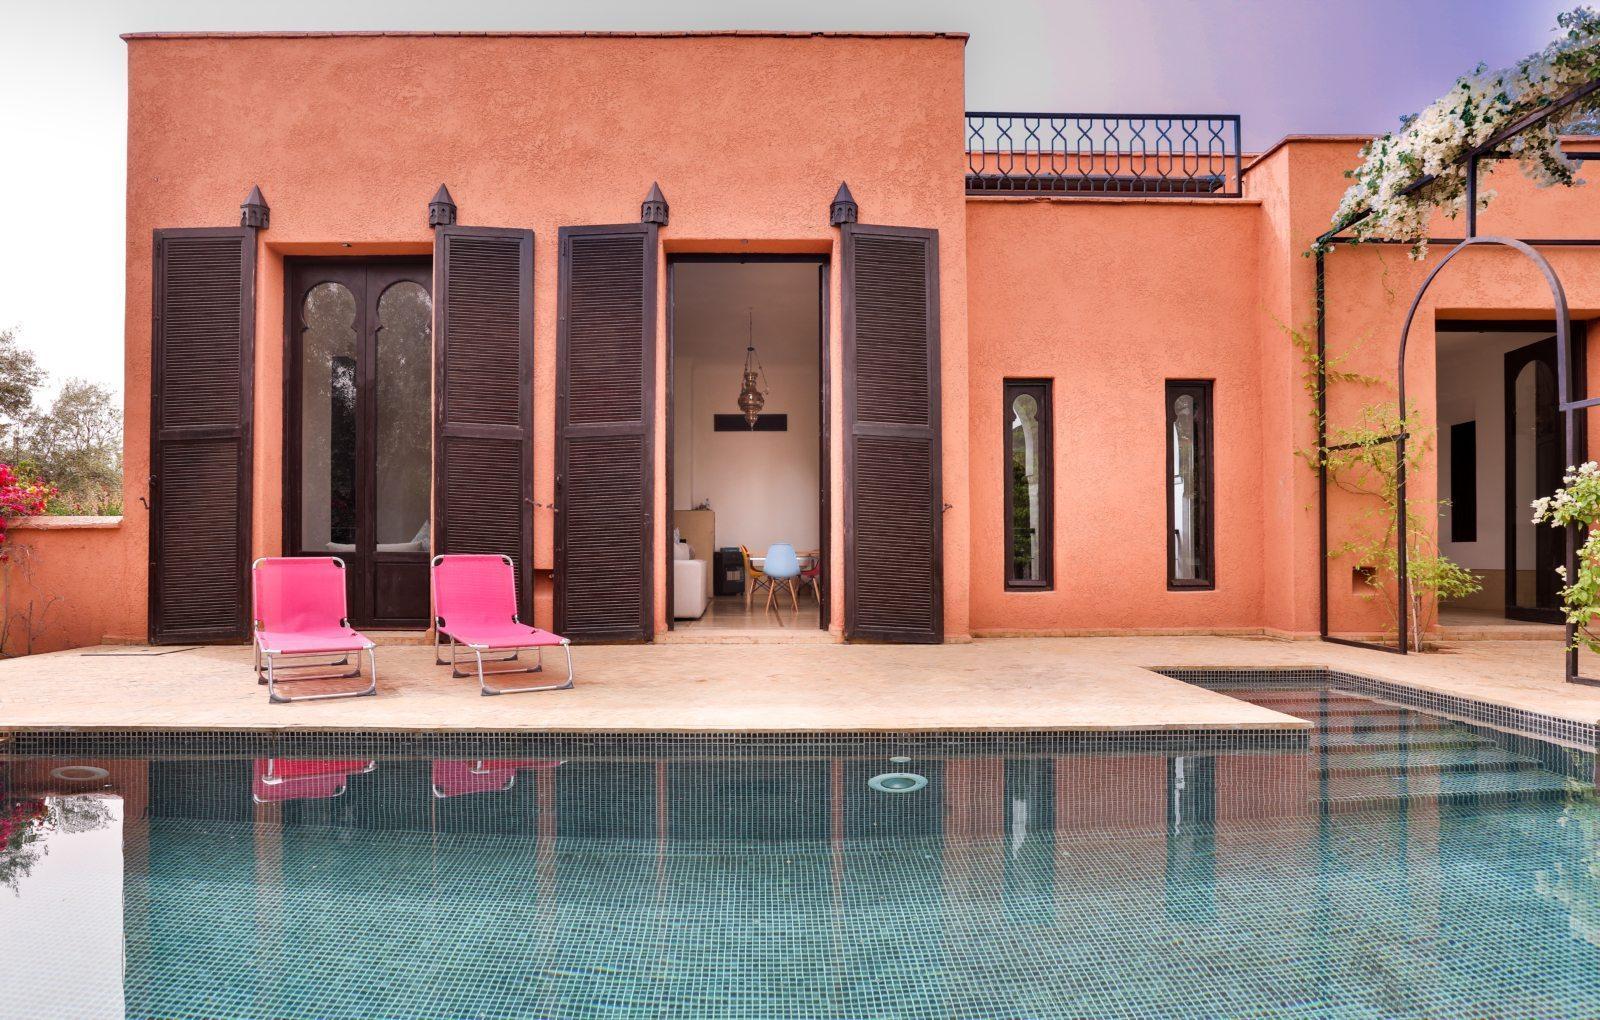 Tr s beau riad avec piscine vendre marrakech 5 for Riad a marrakech avec piscine